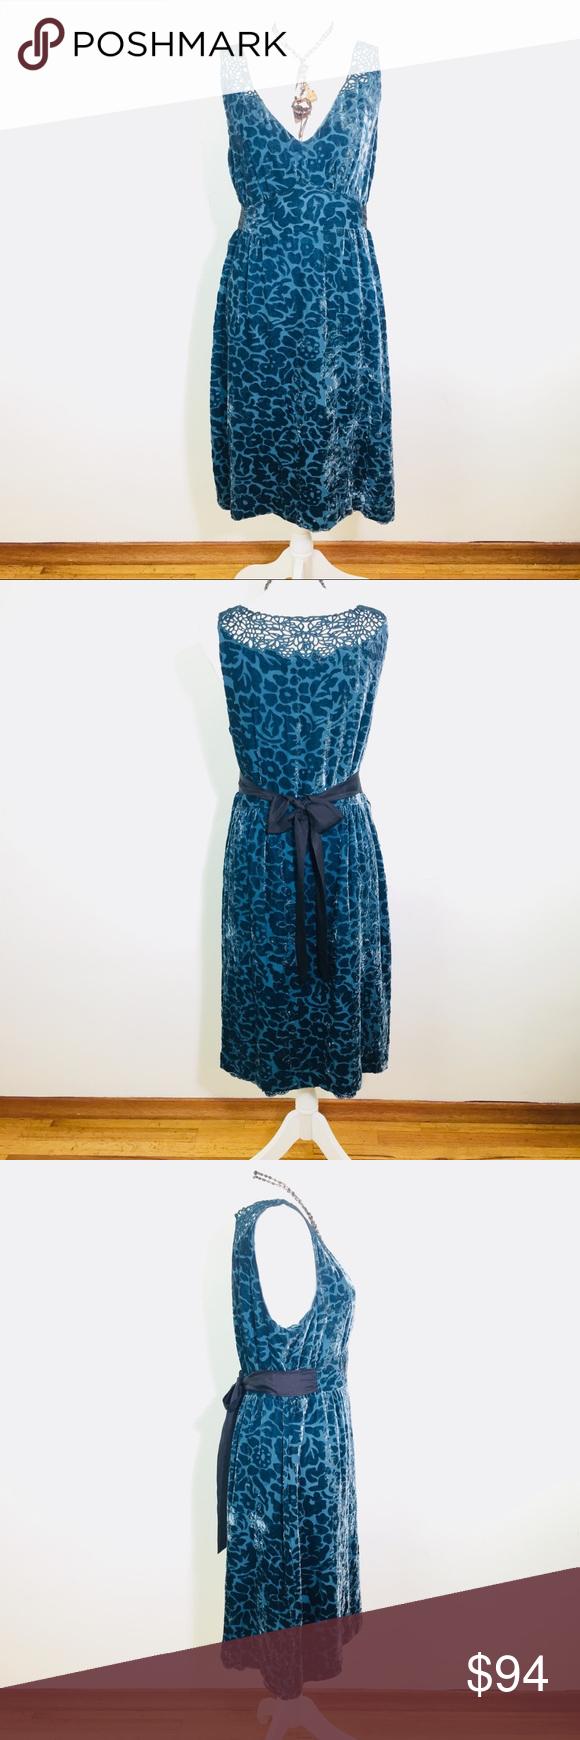 f57696ab678 ANTHROPOLOGIE MOULINETTE SOEURS DRESS Size 12